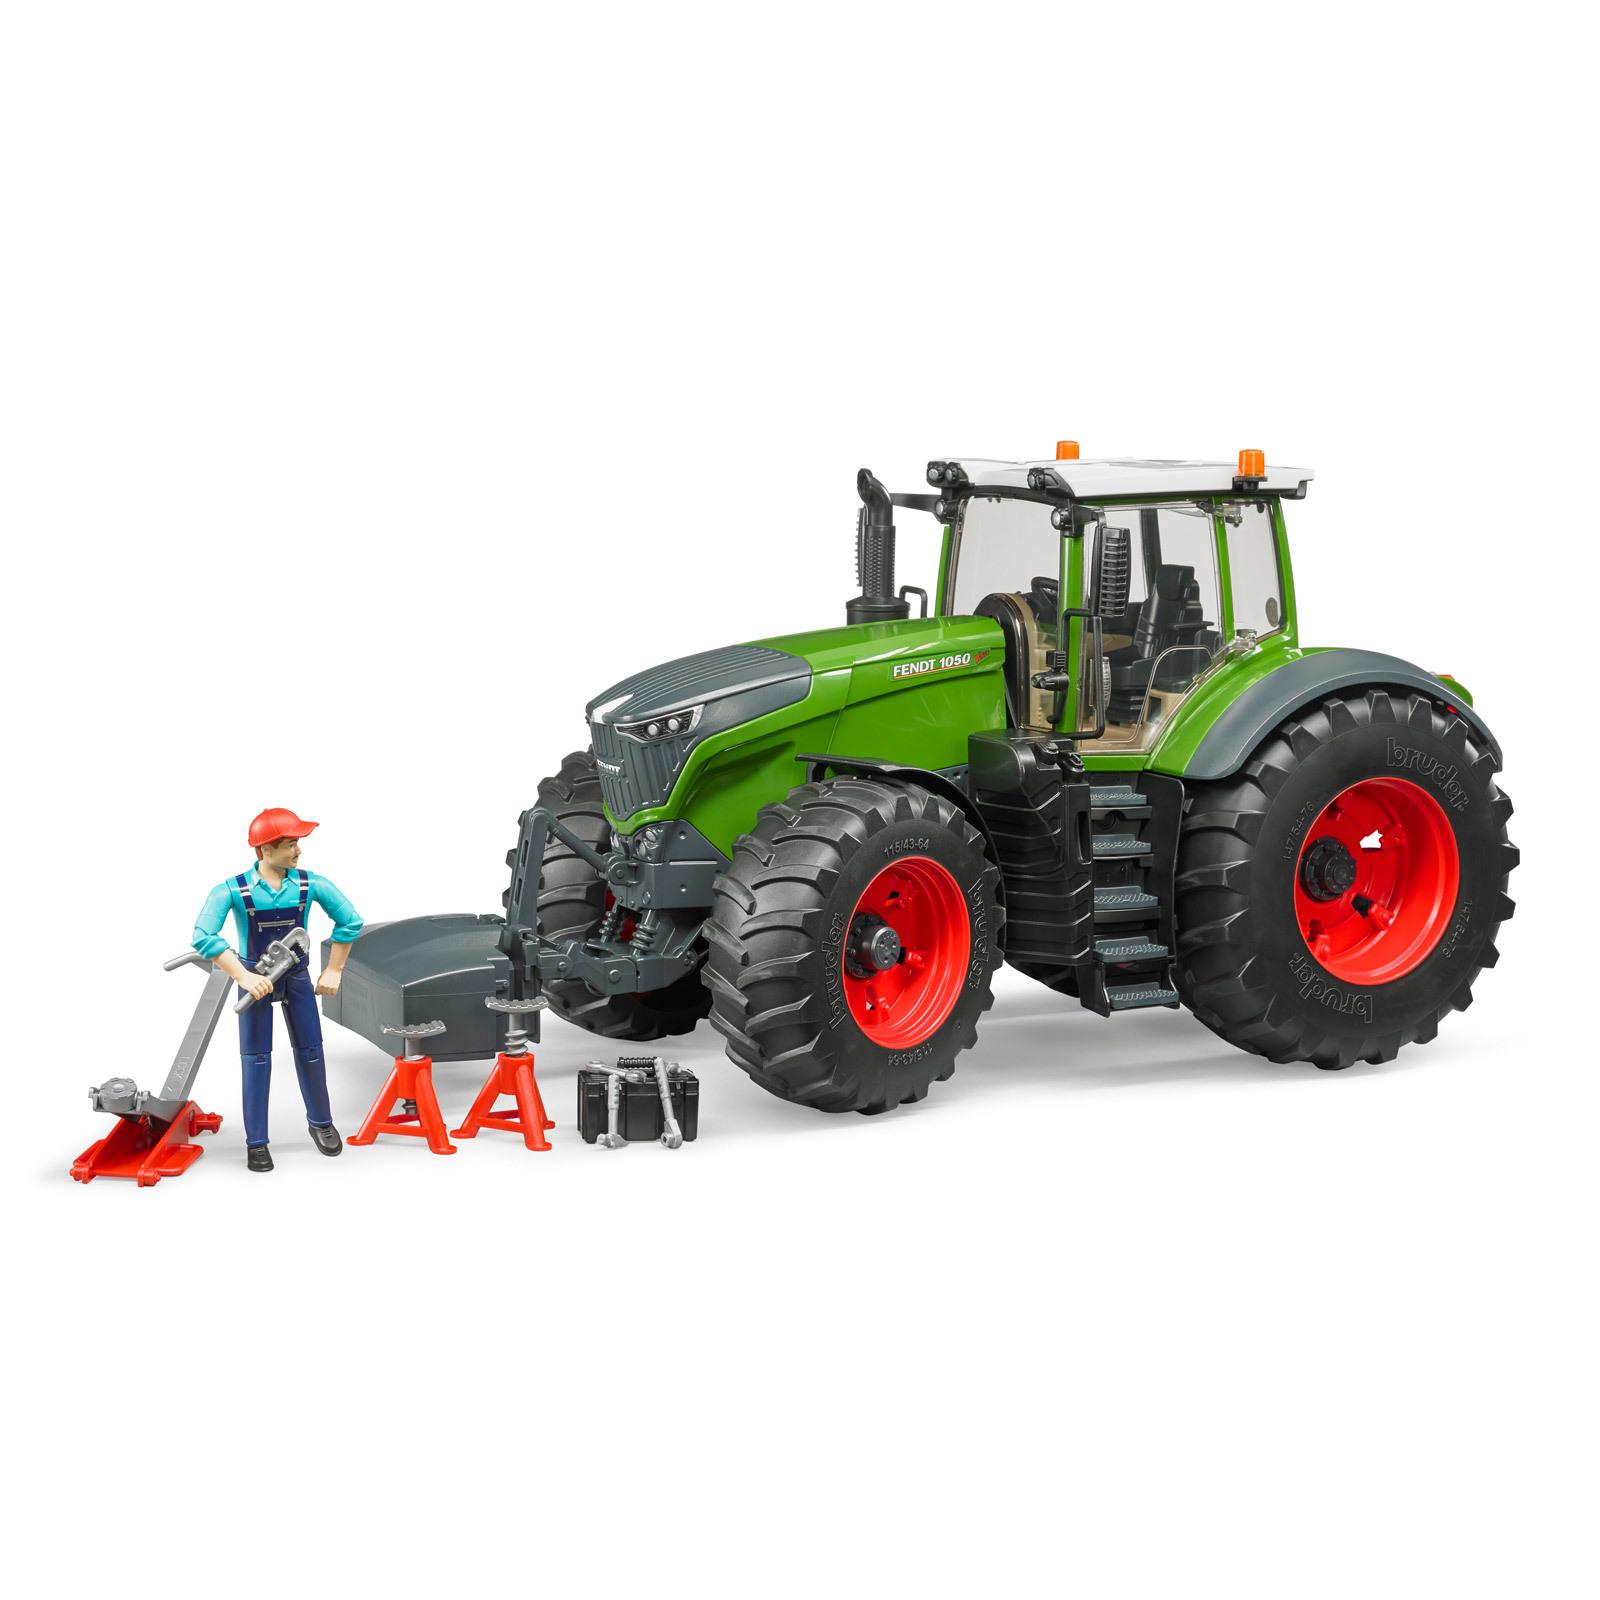 bruder traktor fendt 1050 vario mit mechaniker und. Black Bedroom Furniture Sets. Home Design Ideas